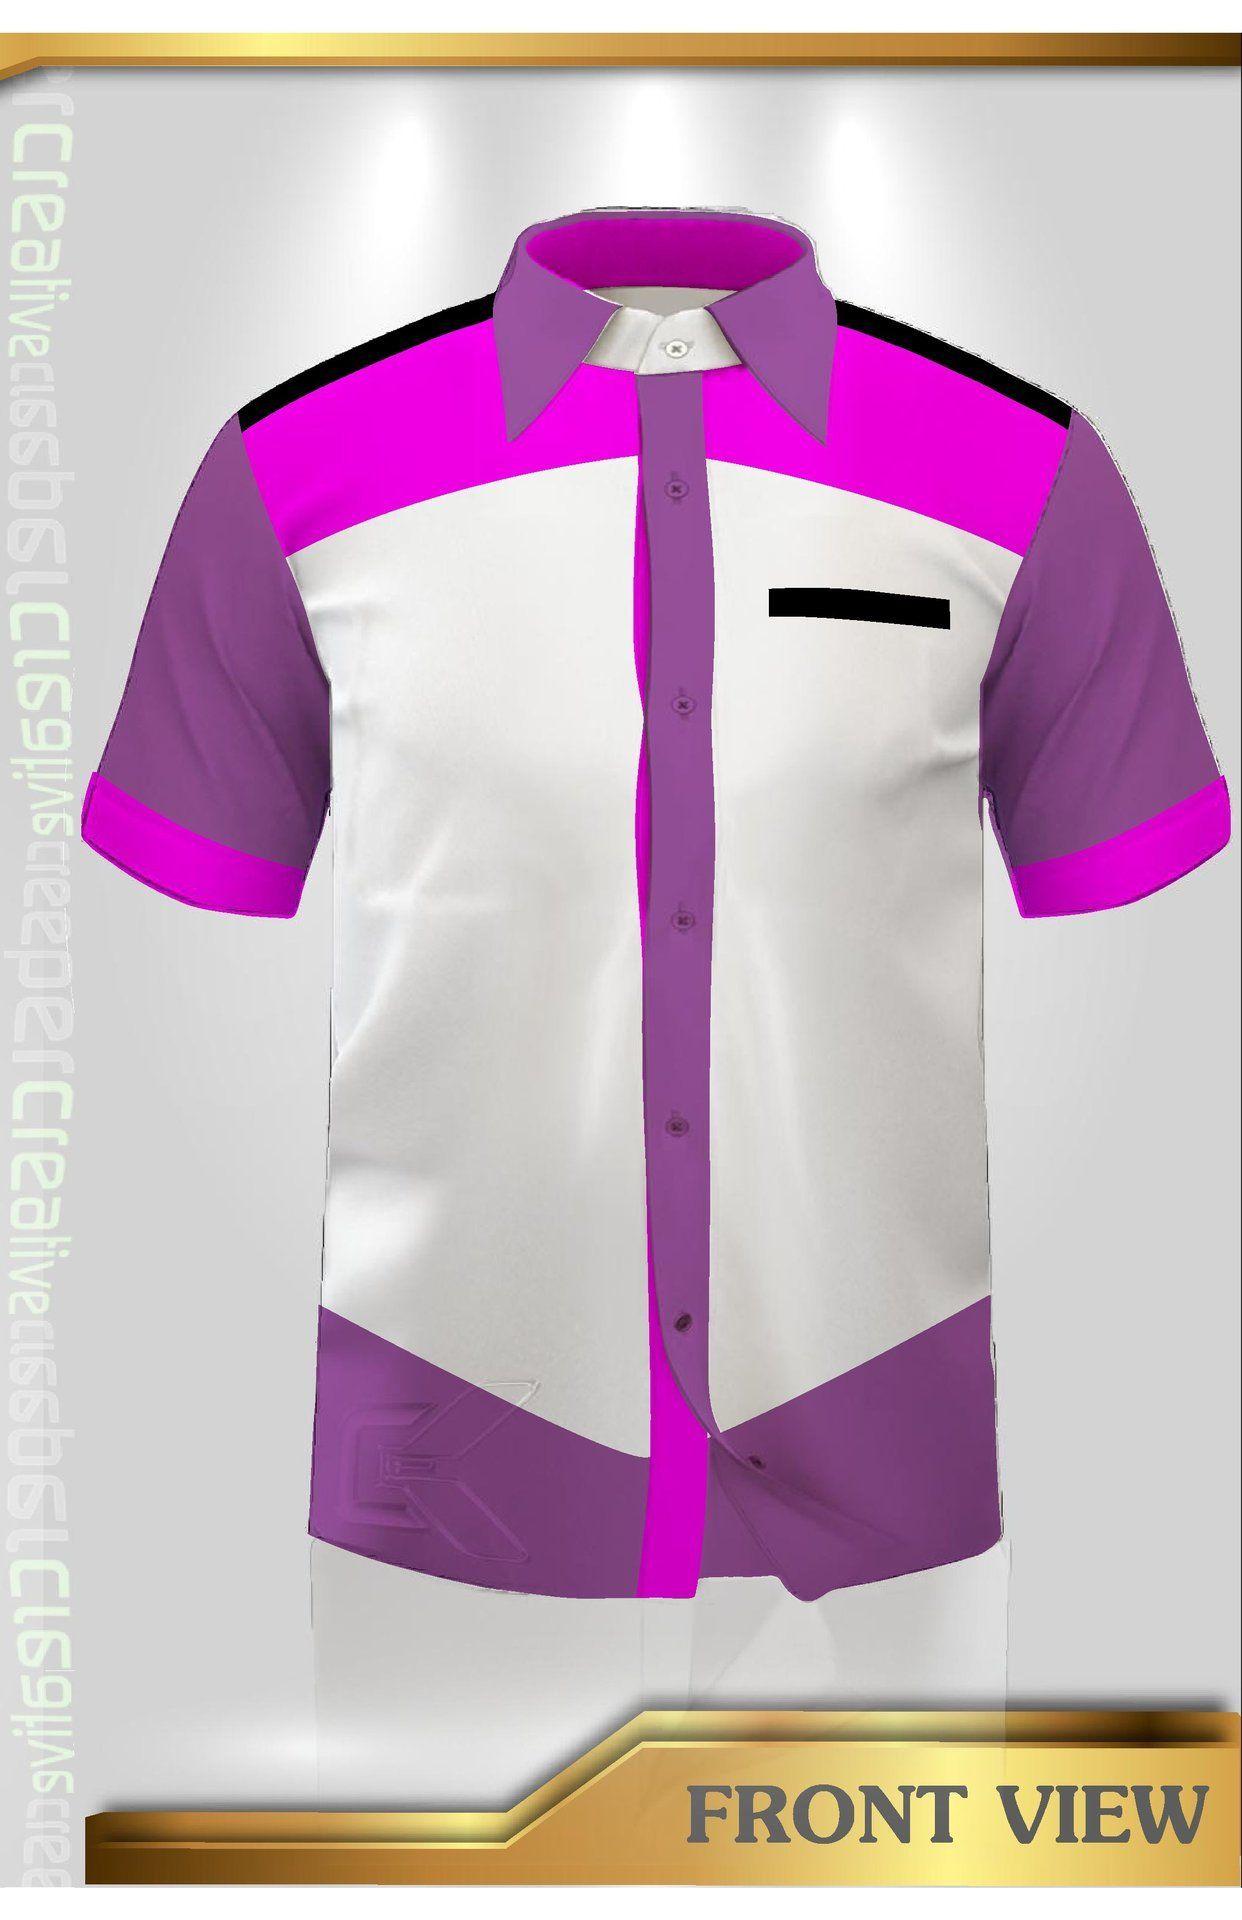 Custom Printed Dress Custom Printed Dress F1 Uniform Corporate